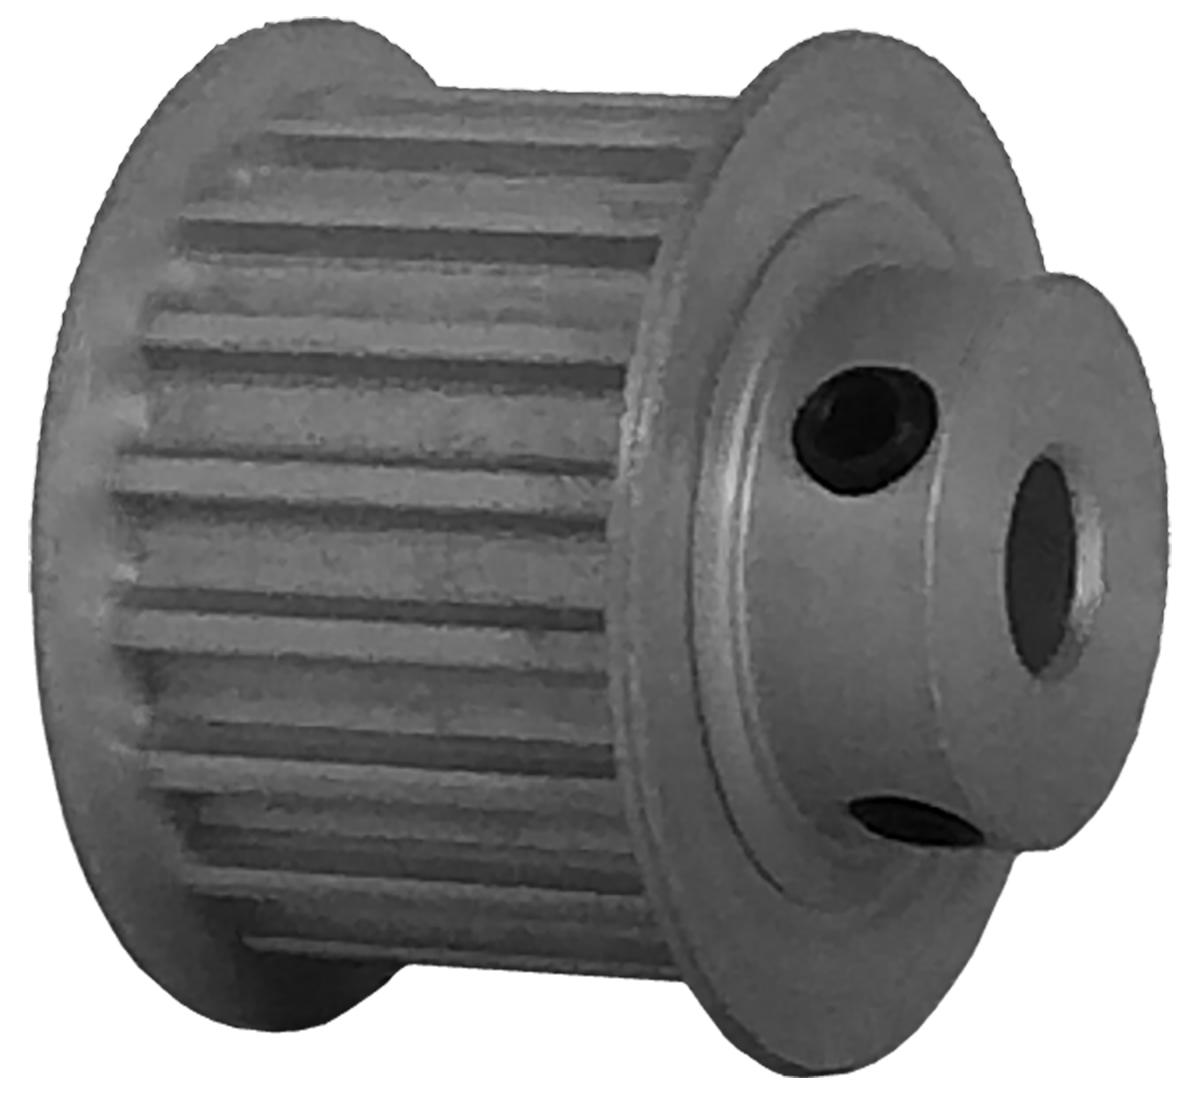 18-5M15-6FA3 - Aluminum Powerhouse®HTD® Pulleys